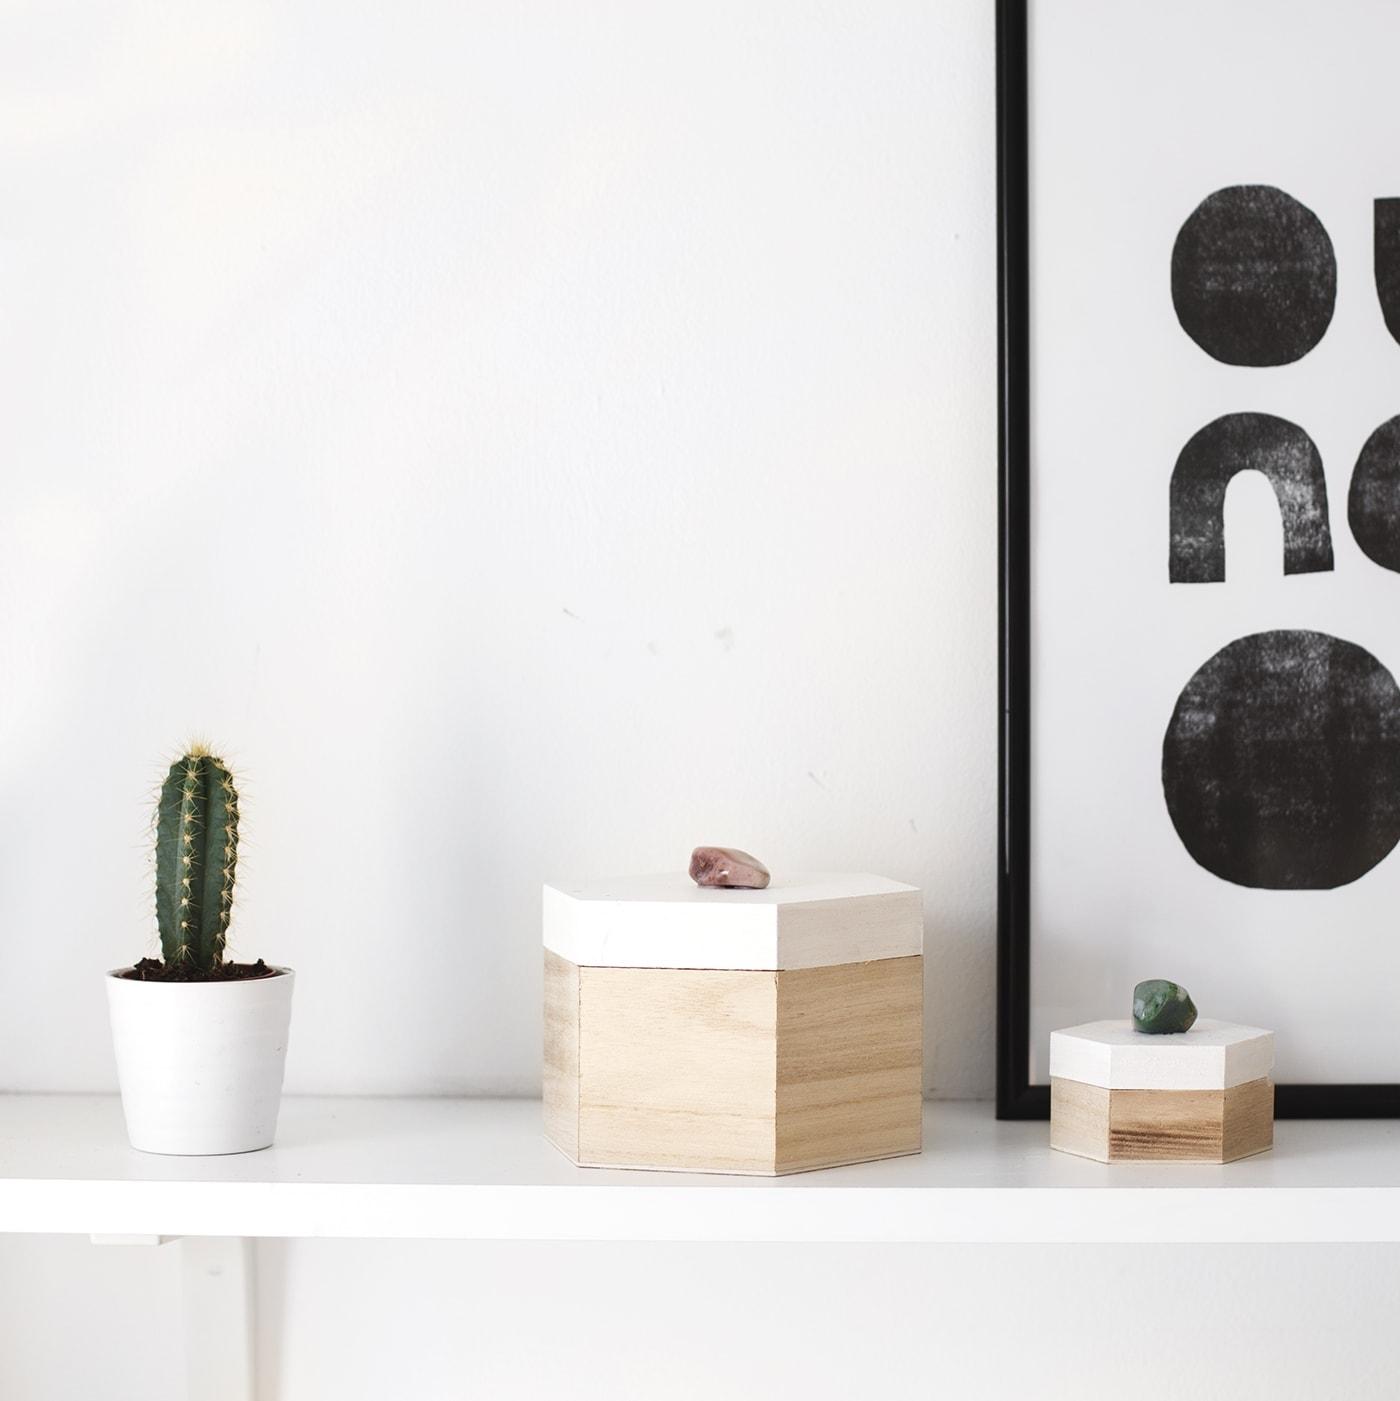 diy-gem-pull-box-storage-home-crafts